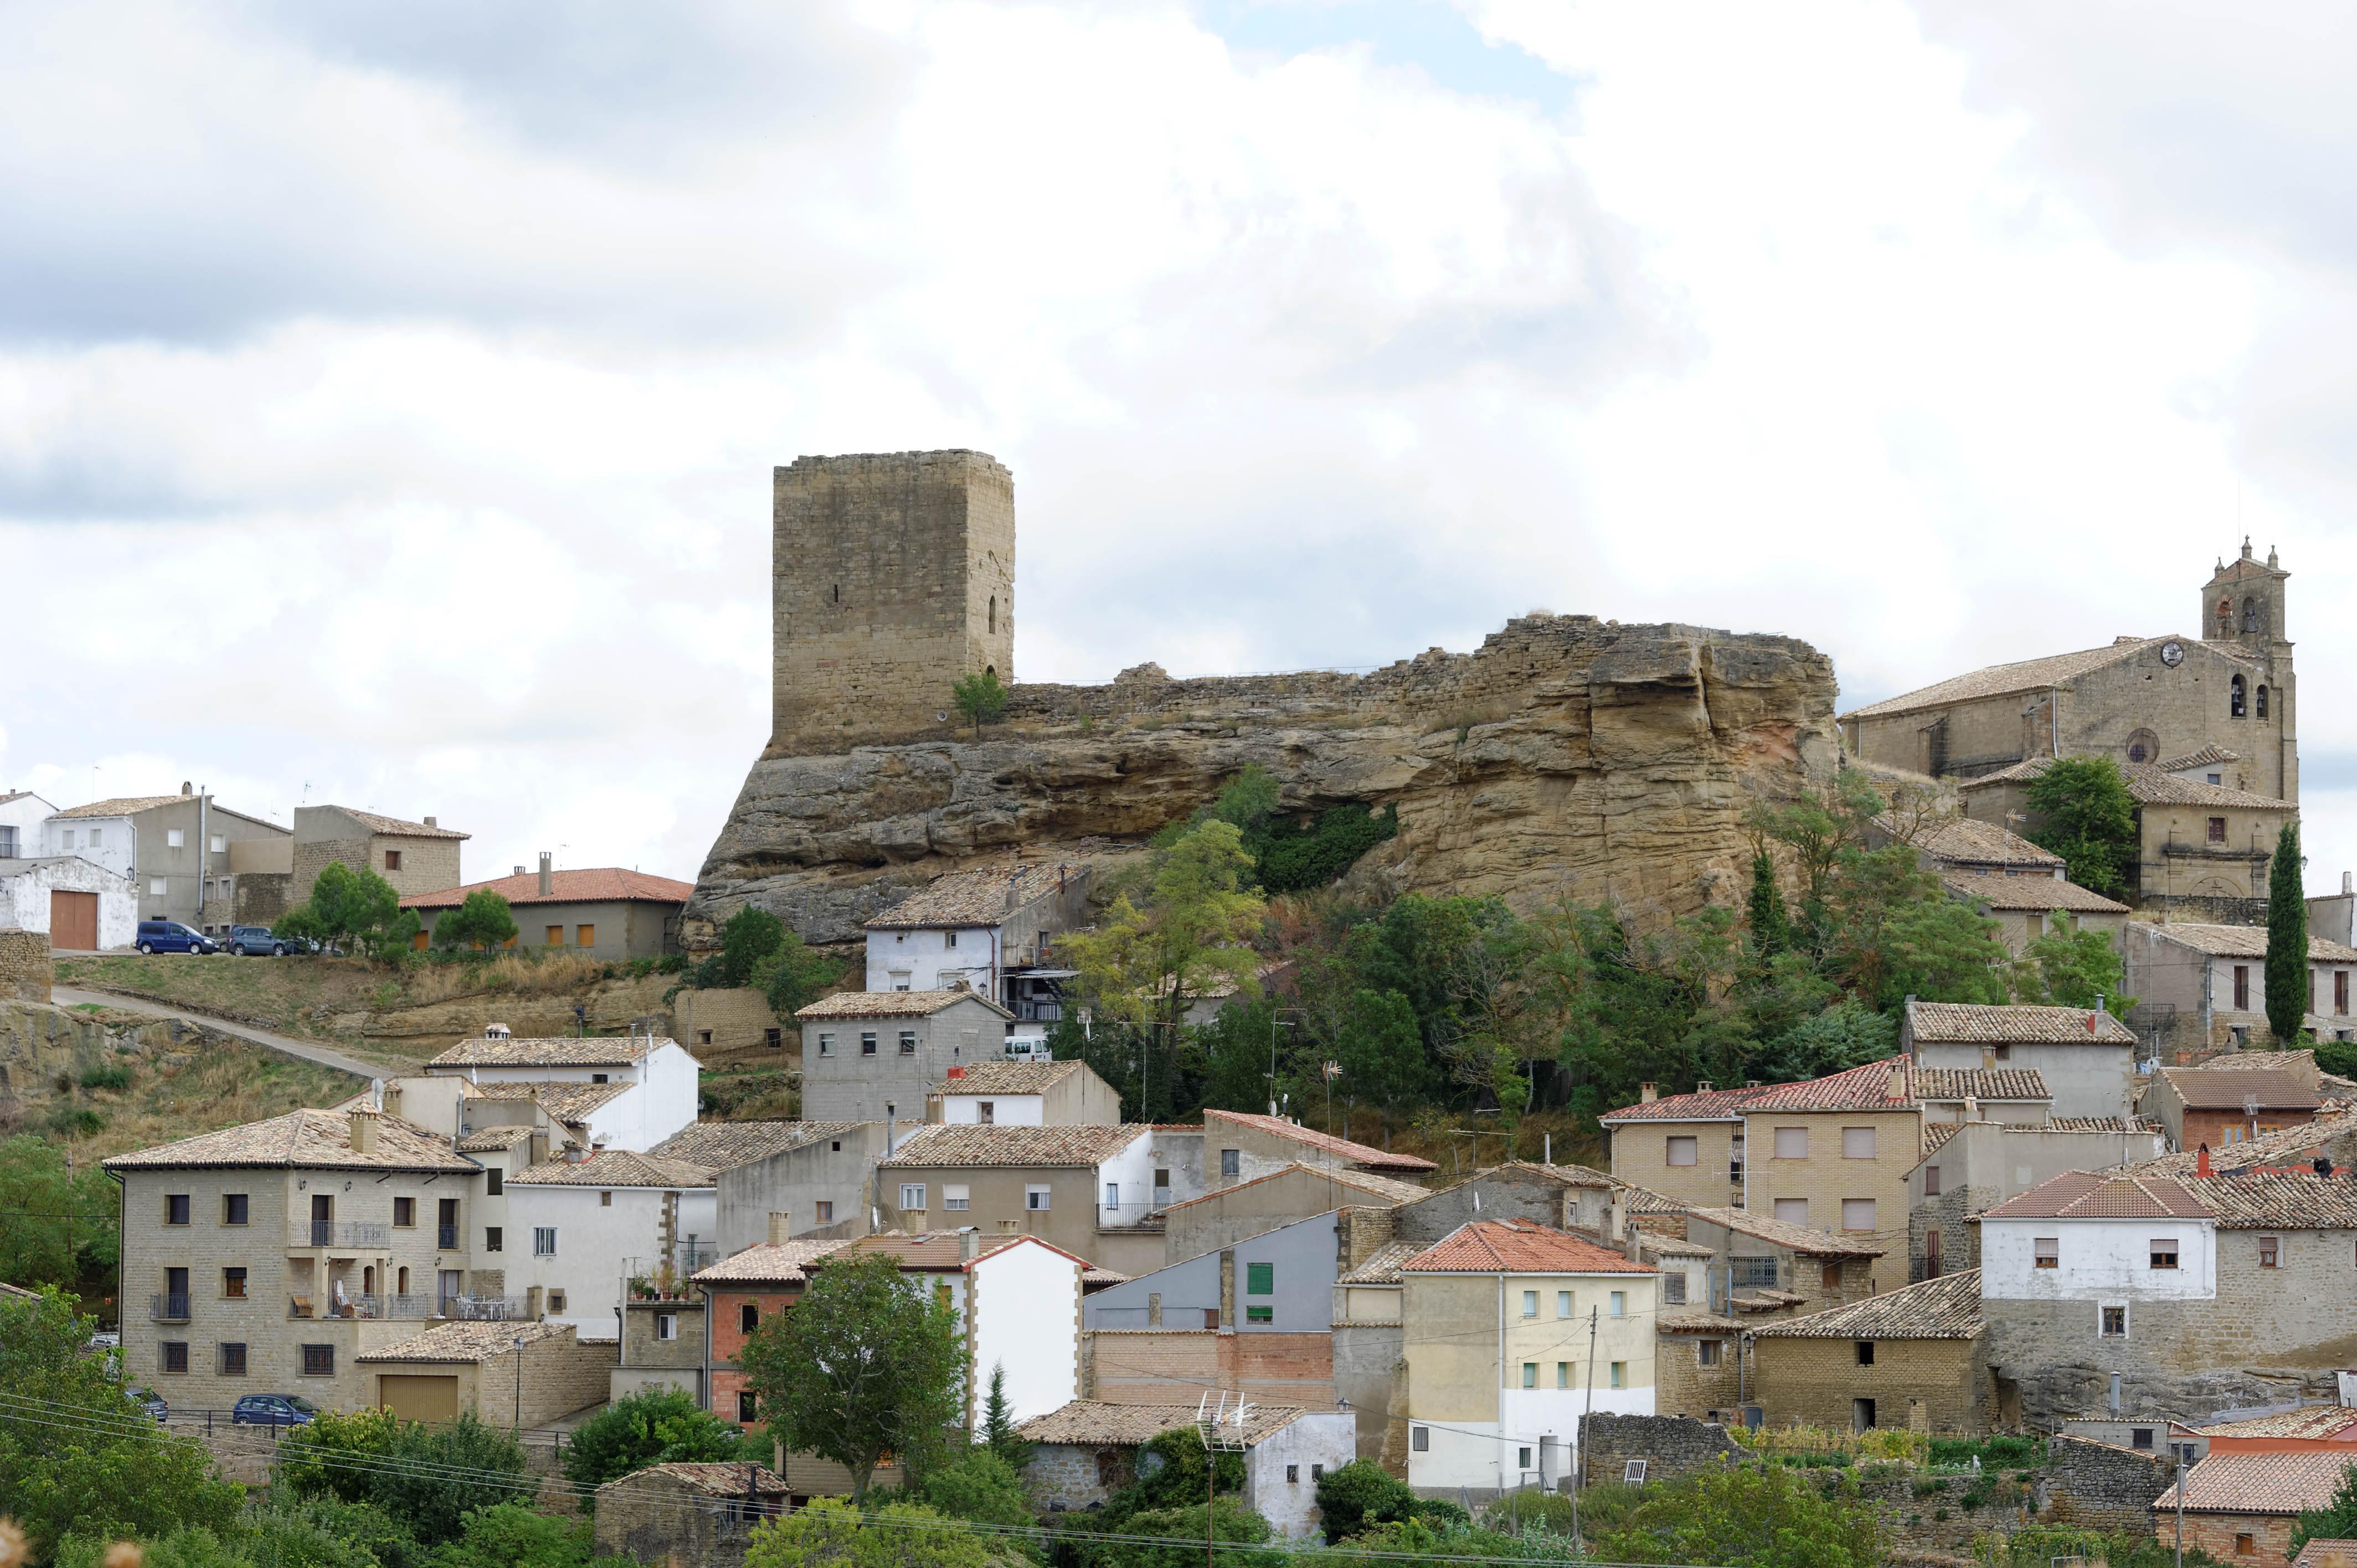 3483_Luesia (Aragon)